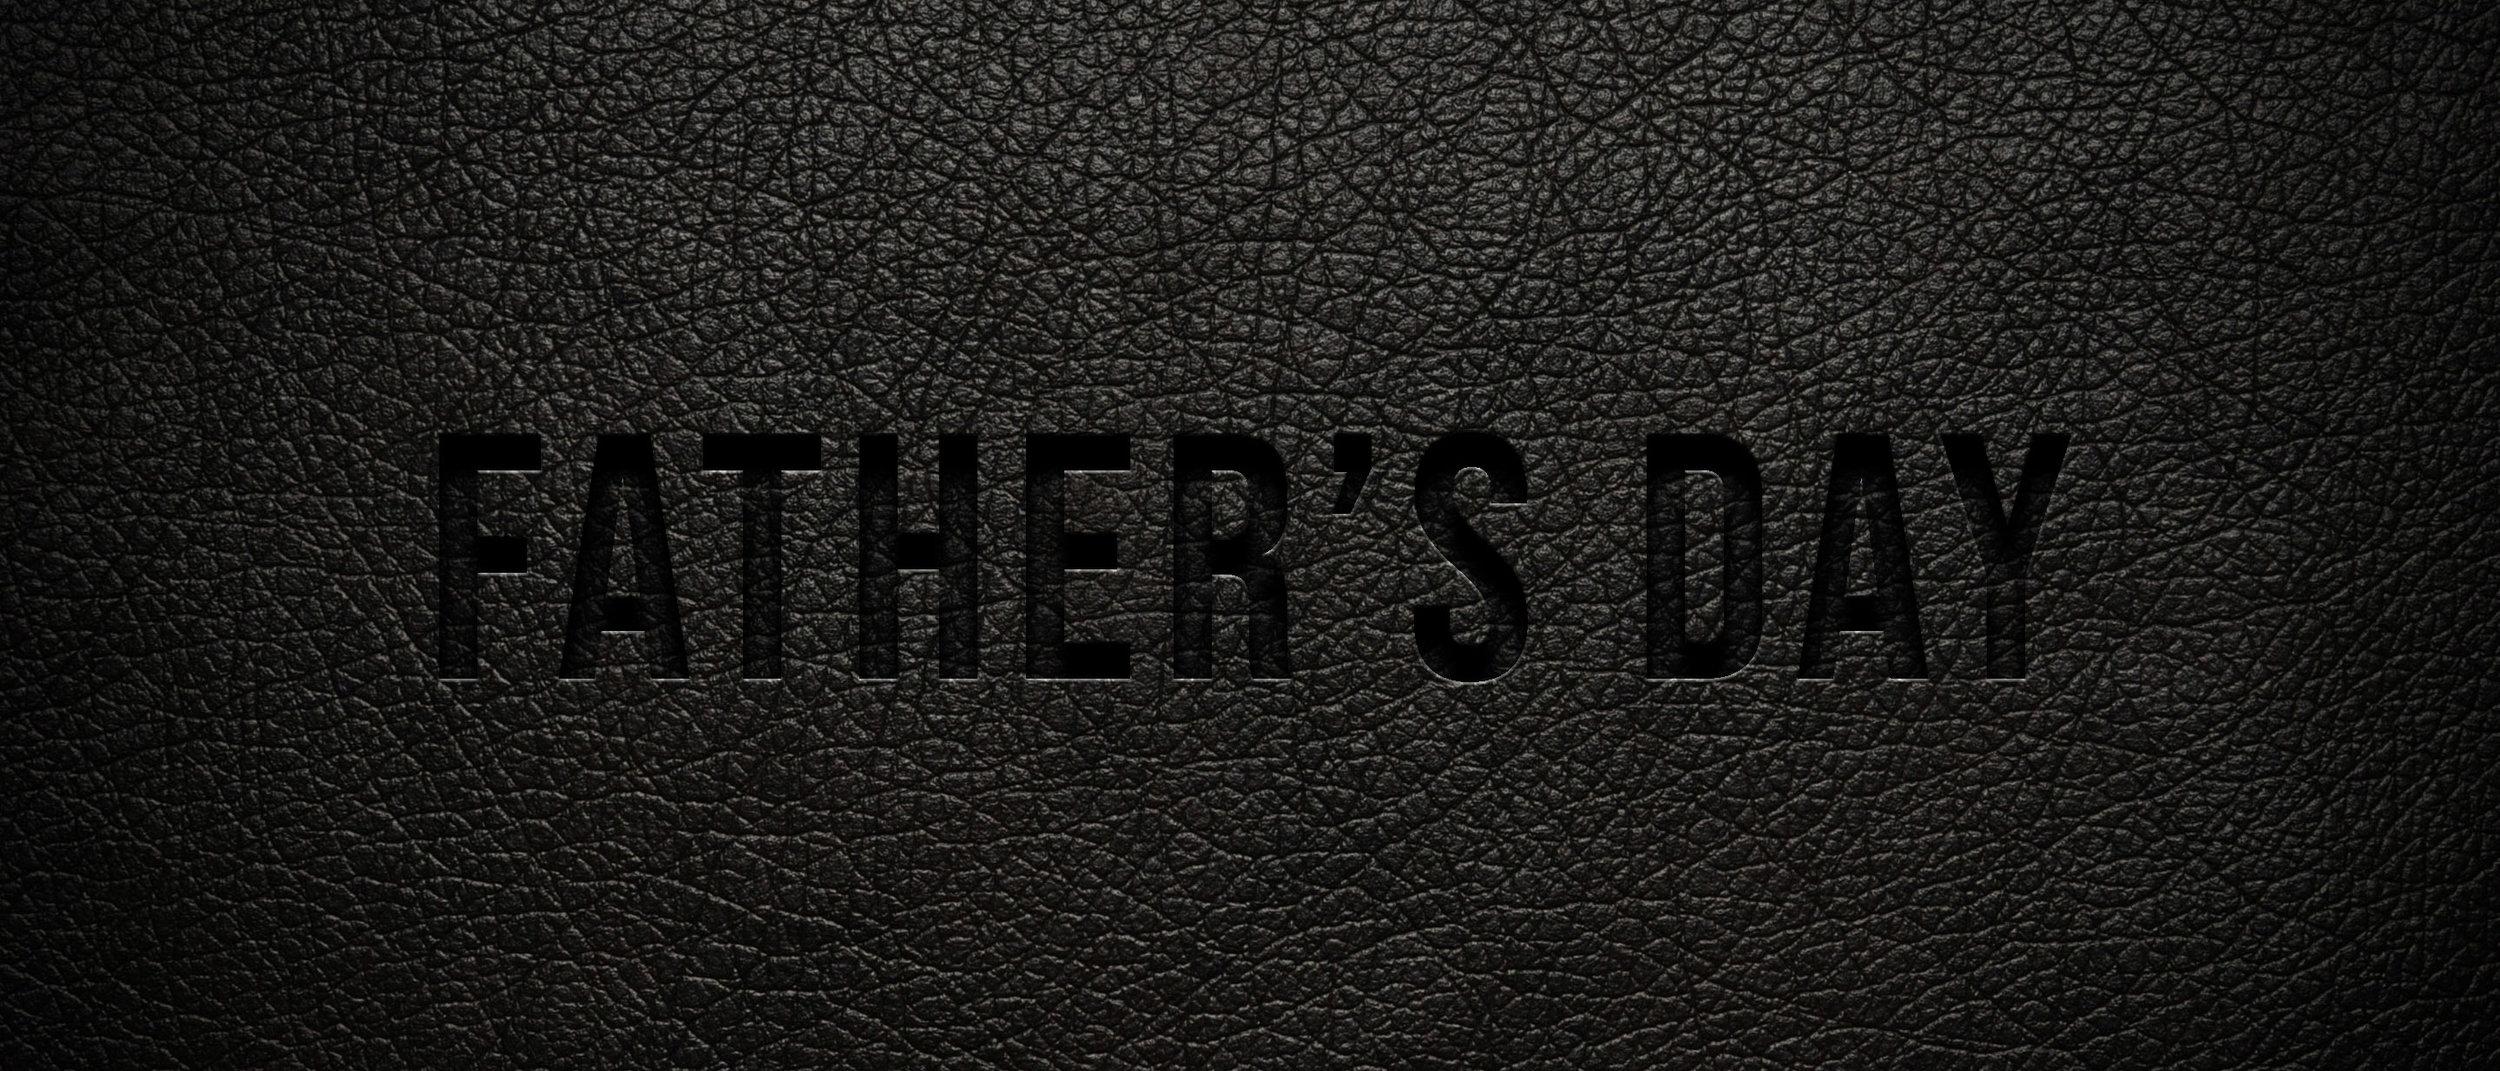 FathersDay01.jpg